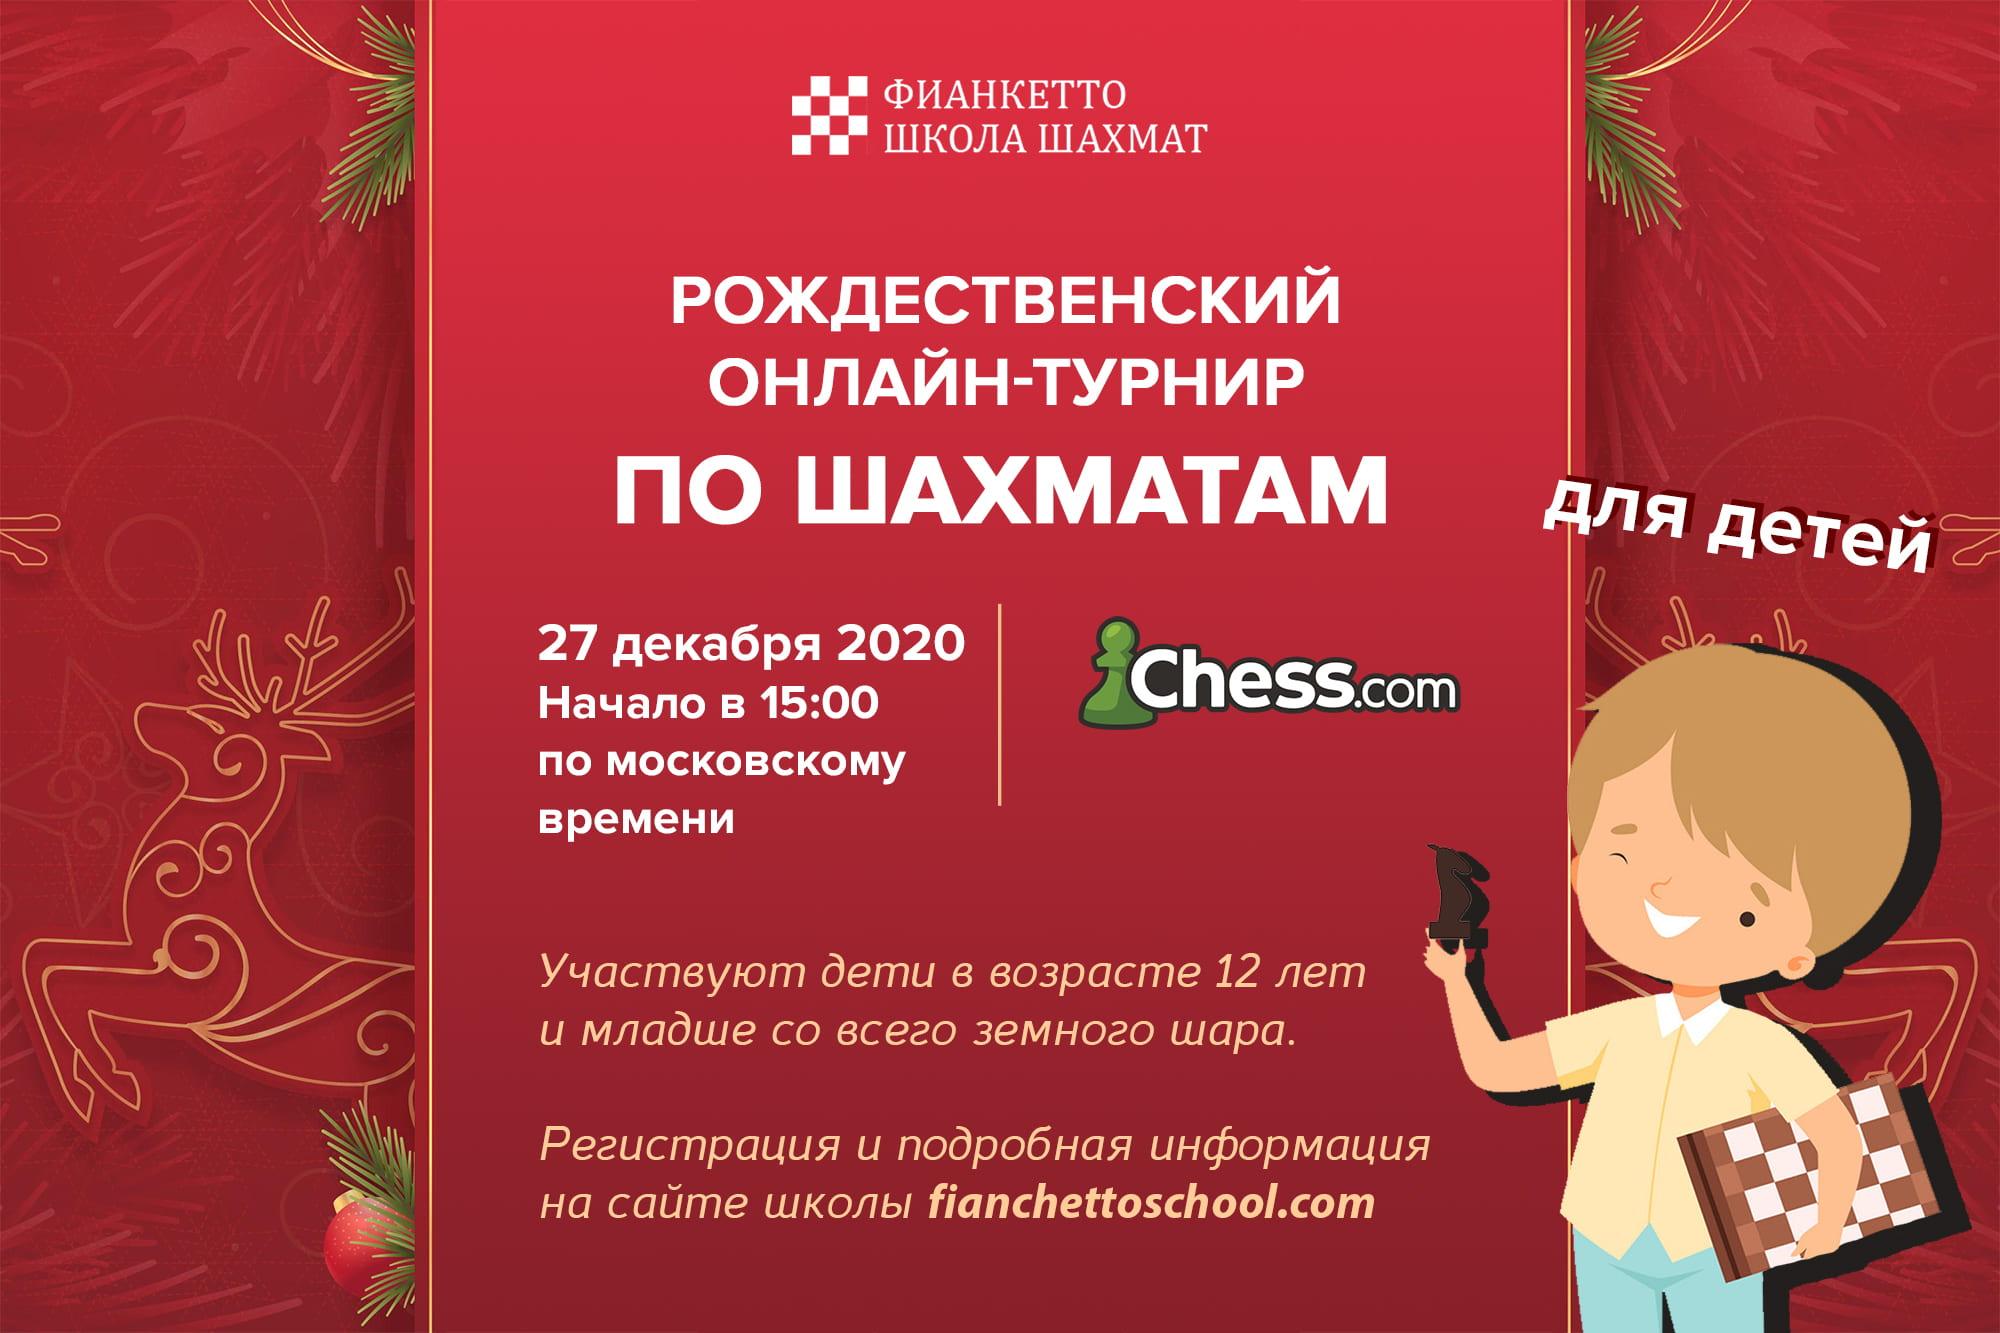 Рождественский онлайн-турнир по шахматам для детей